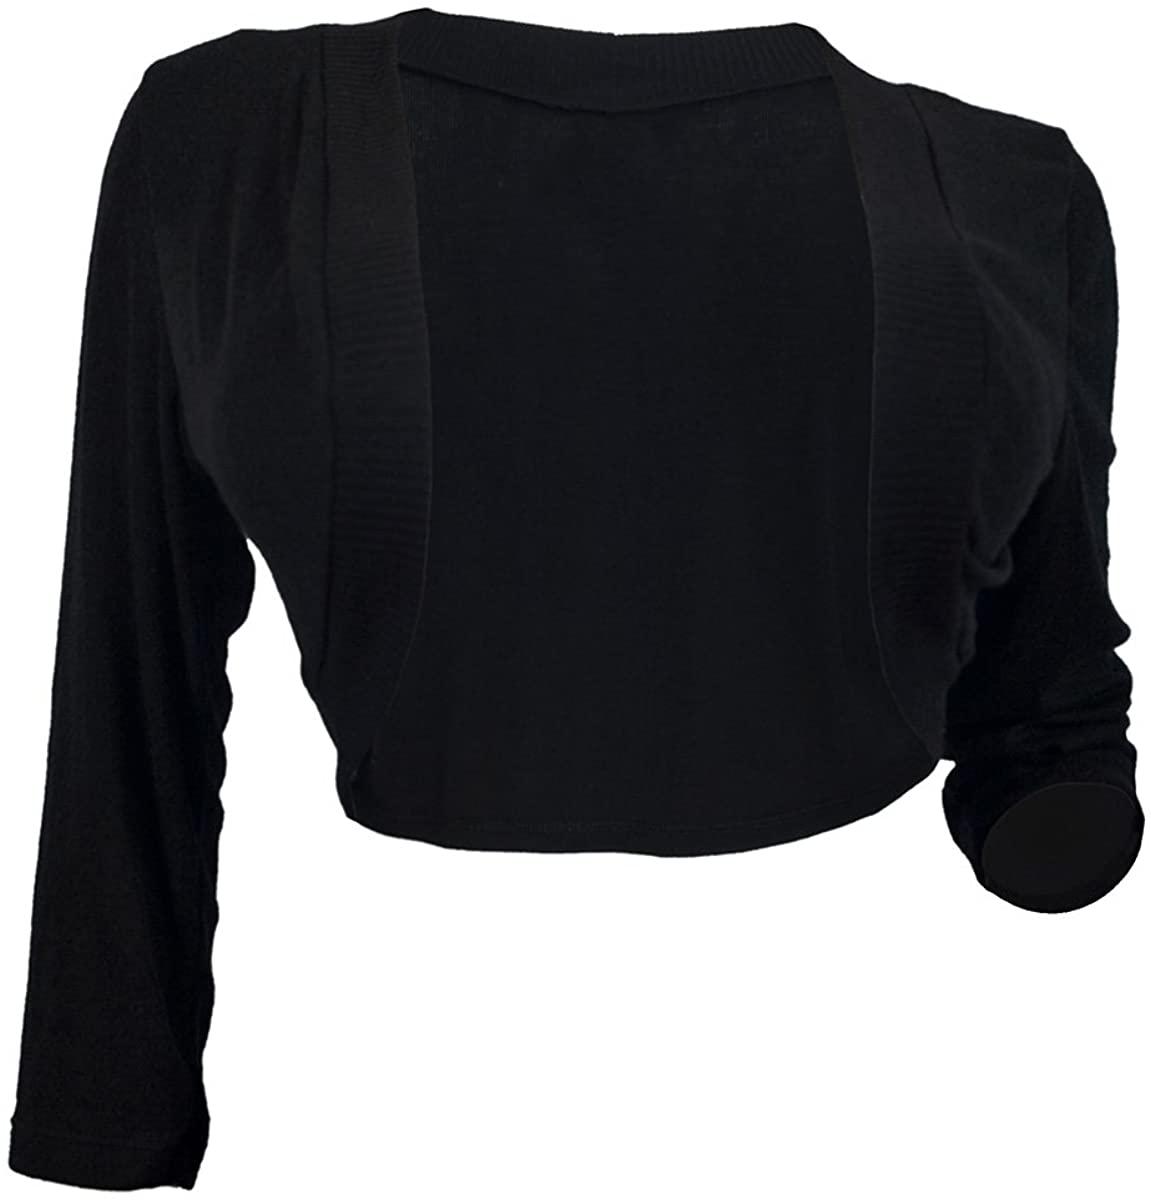 eVogues Women's Black 3/4 Sleeve Cropped Bolero Shrug